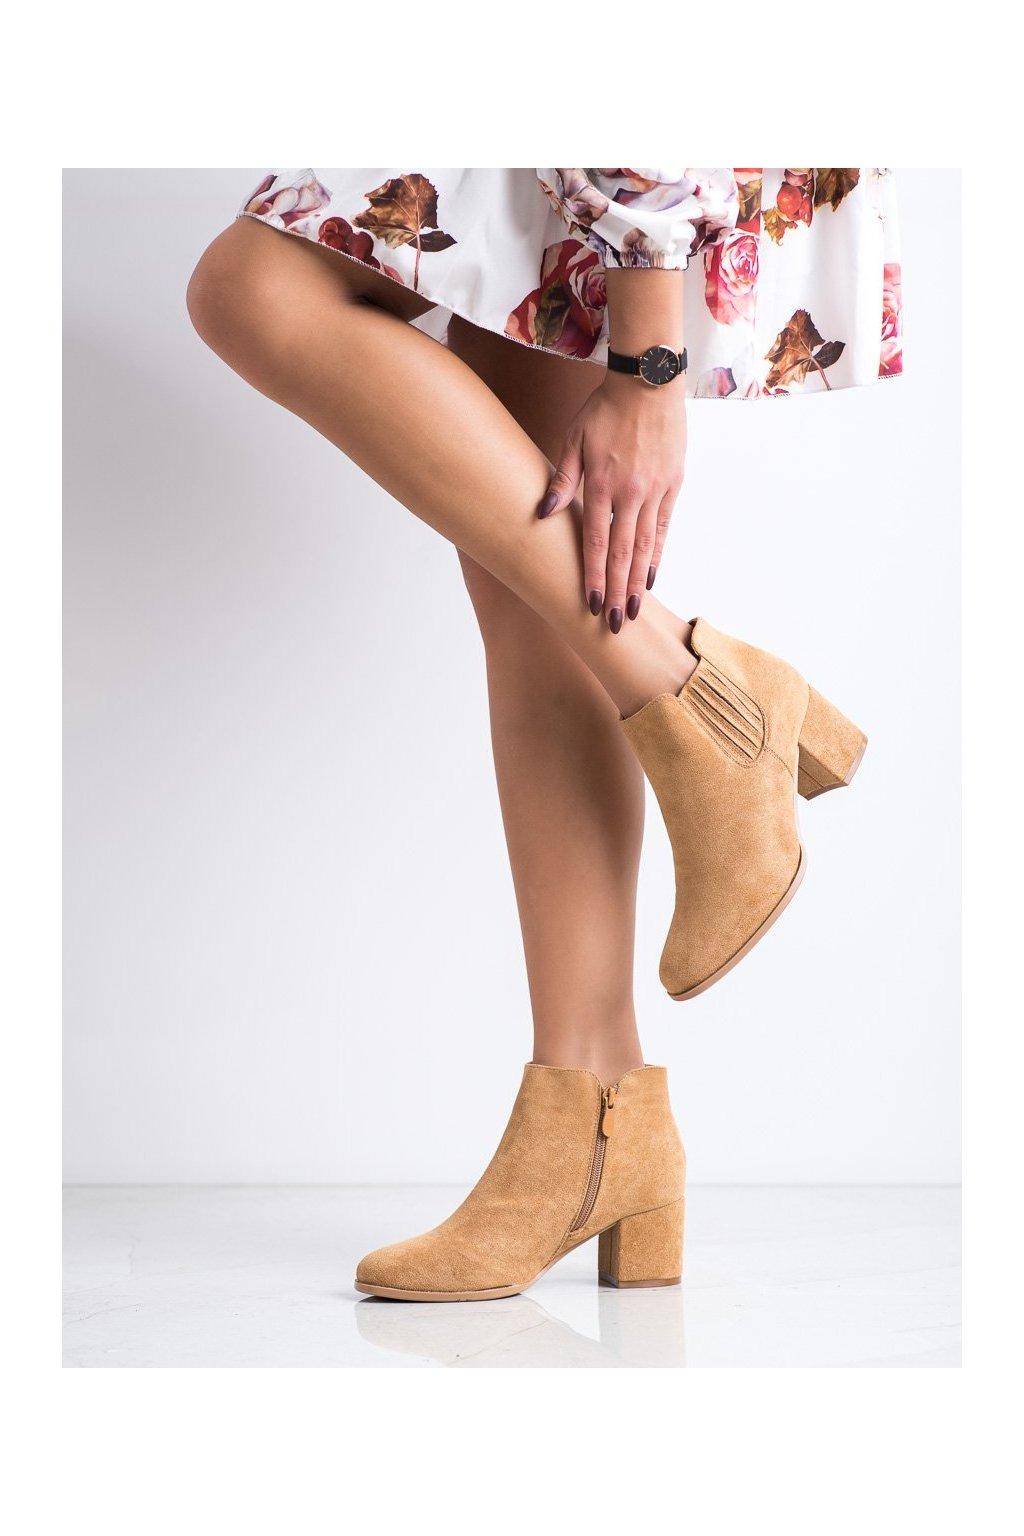 Hnedé dámske topánky Bella paris kod A6208C